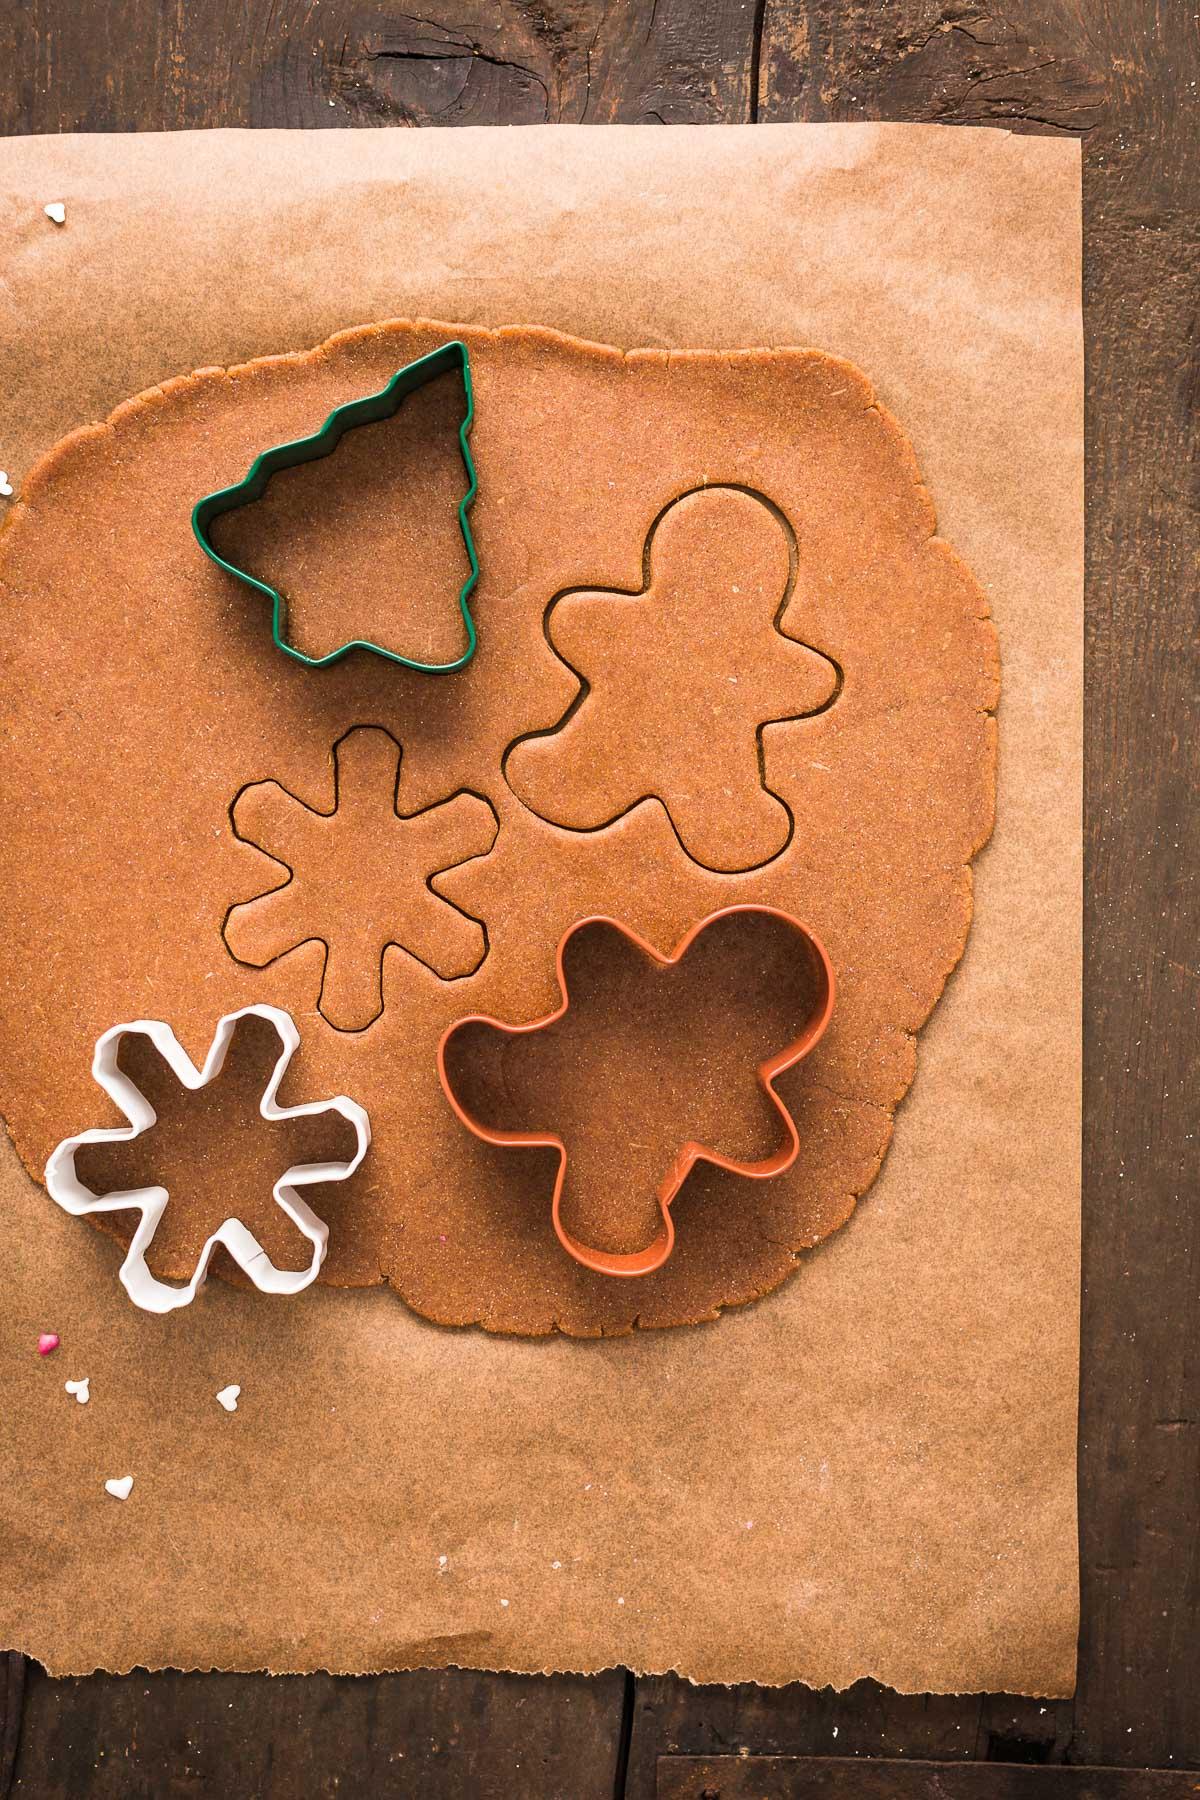 vegan gingerbread man vegani - ricetta biscotti pan di zenzero vegani croccanti leggeri friabili #vegan gingerbread senza burro